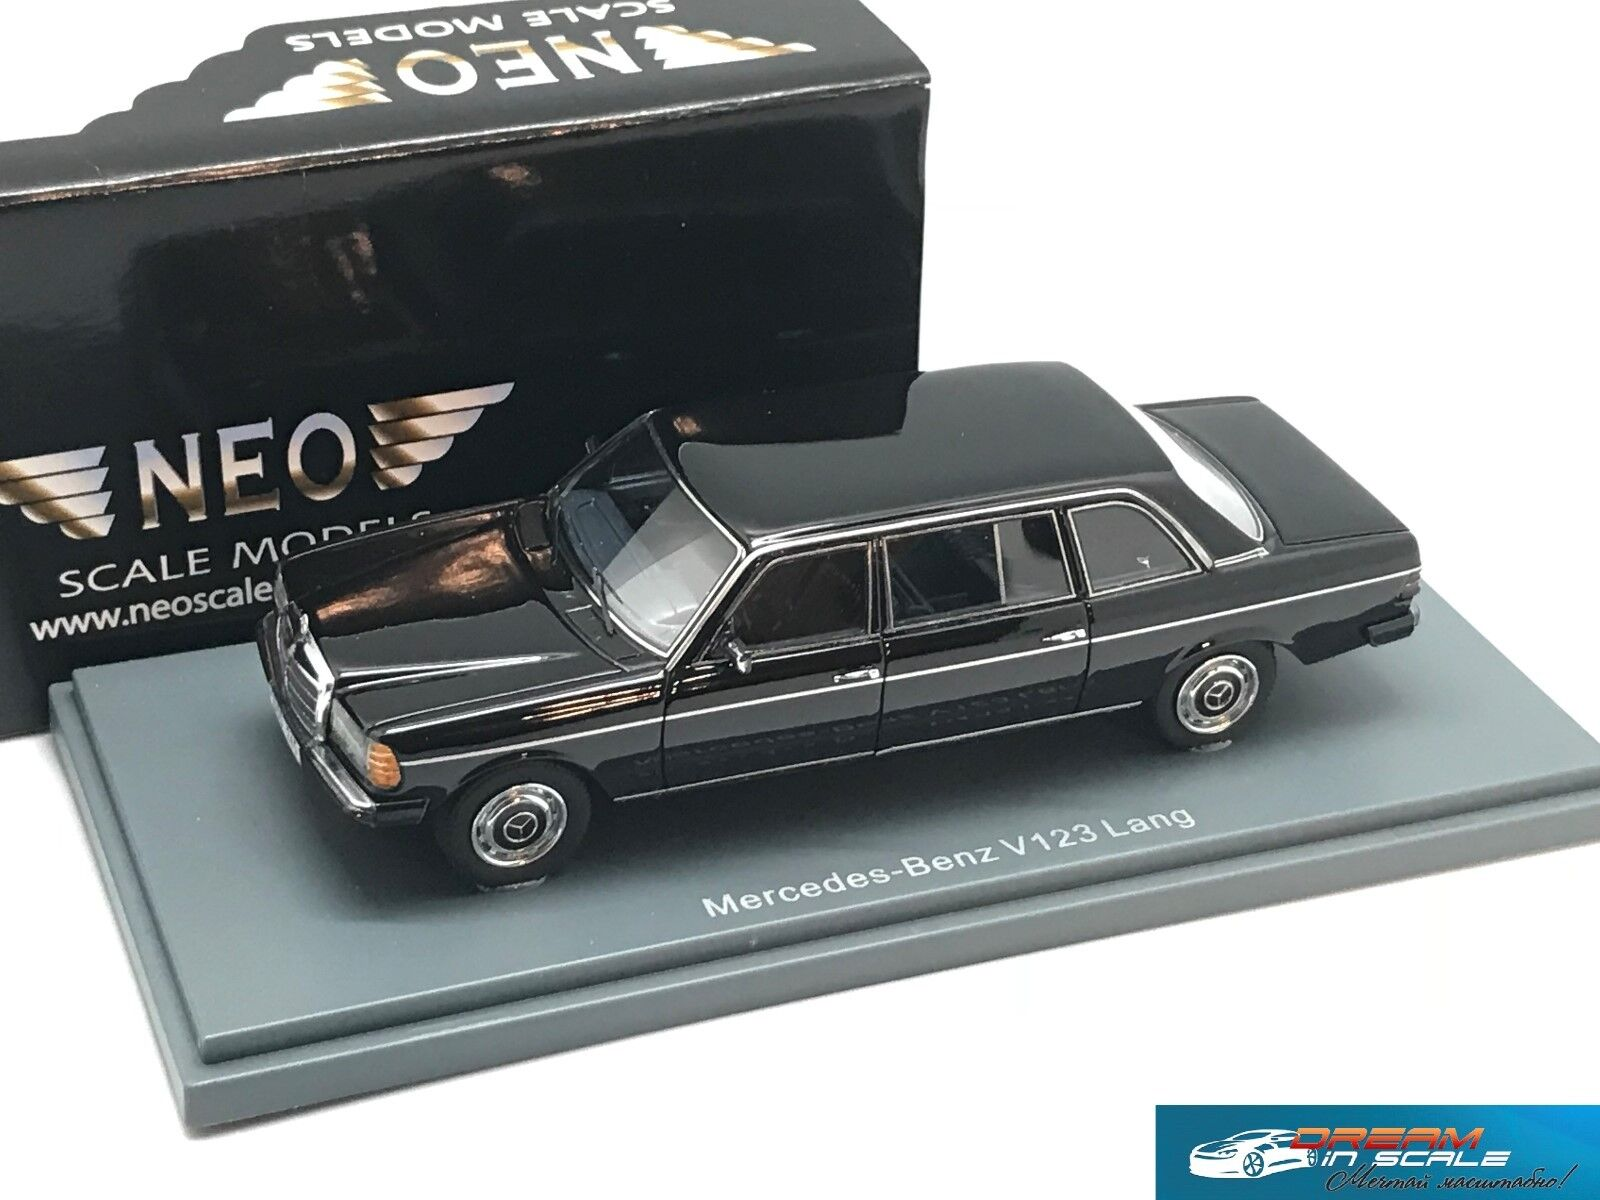 Mercedes Benz W123 Lang nero 1978 NEO44245 1 43